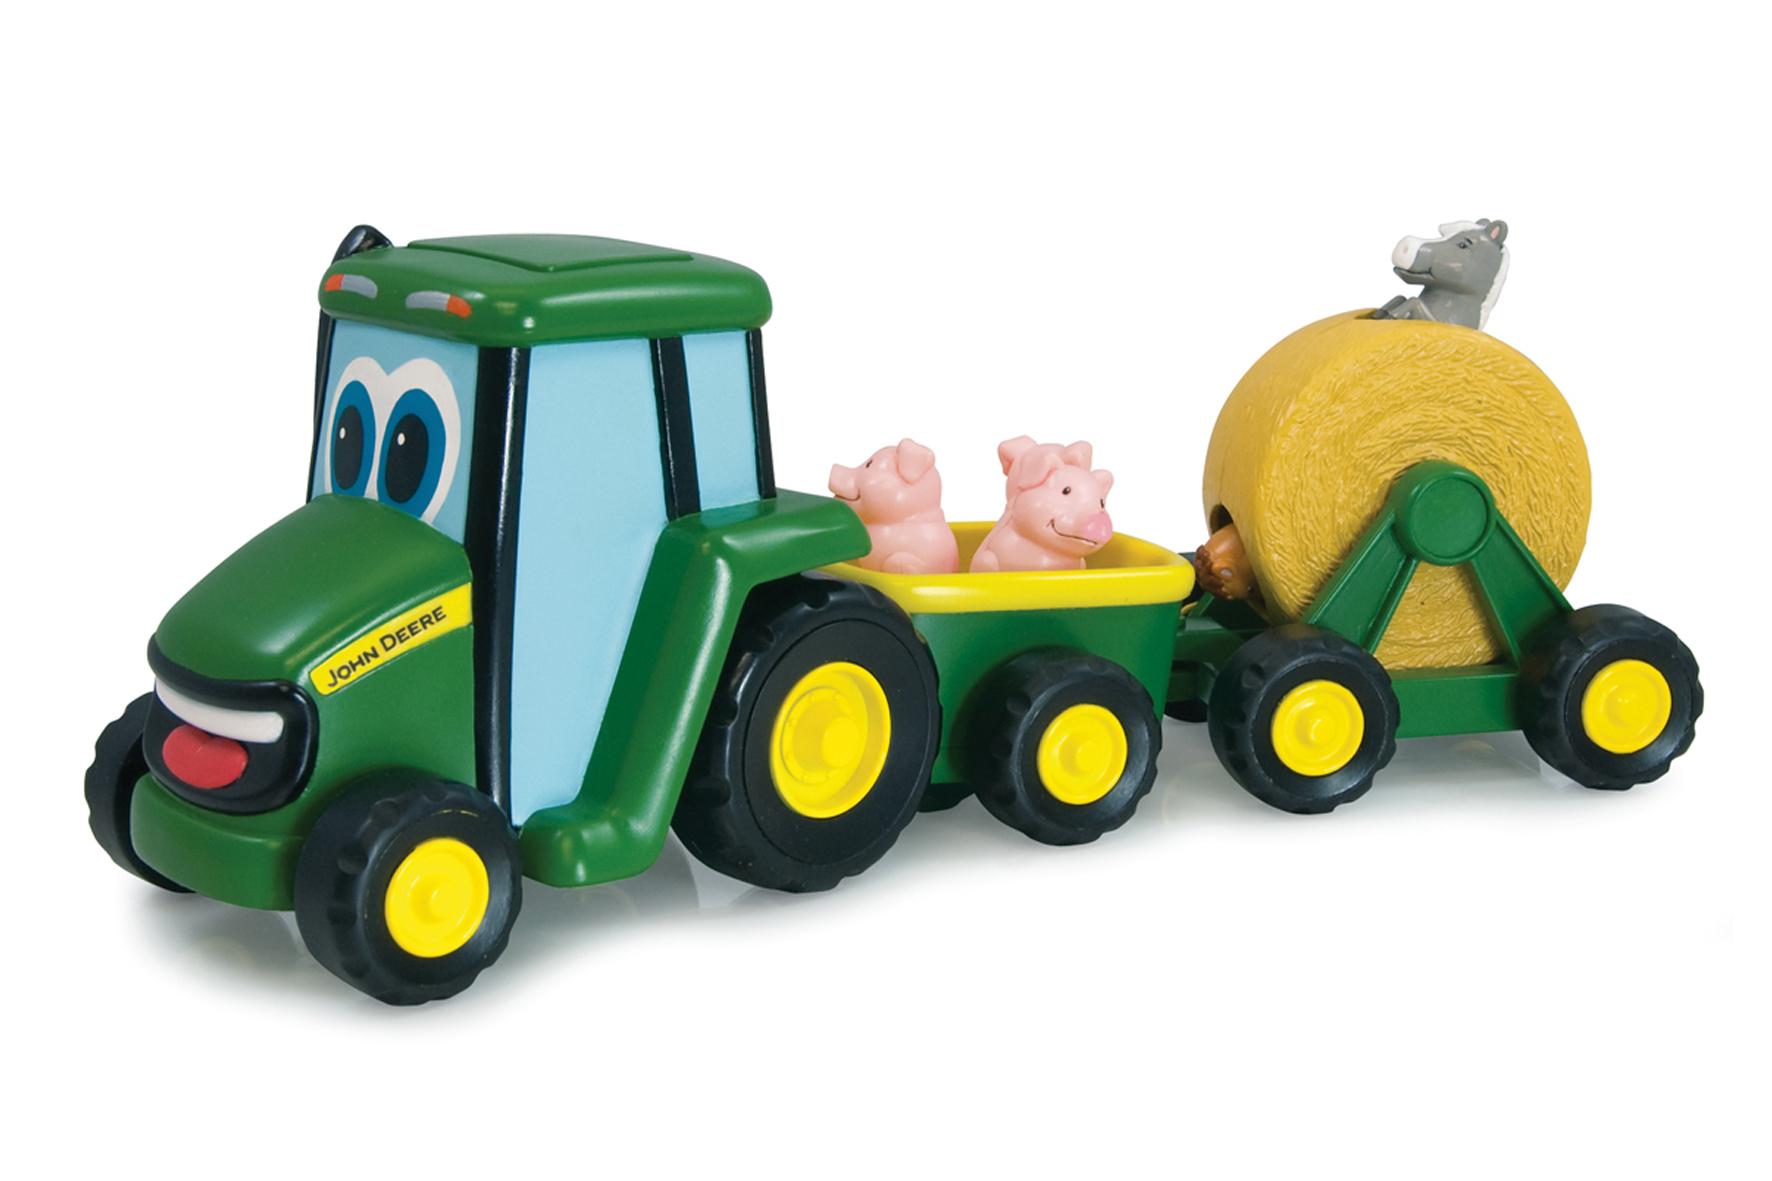 tomy john deere 35089 johnny le tracteur et son attelage musical - Tracteur John Deere Enfant